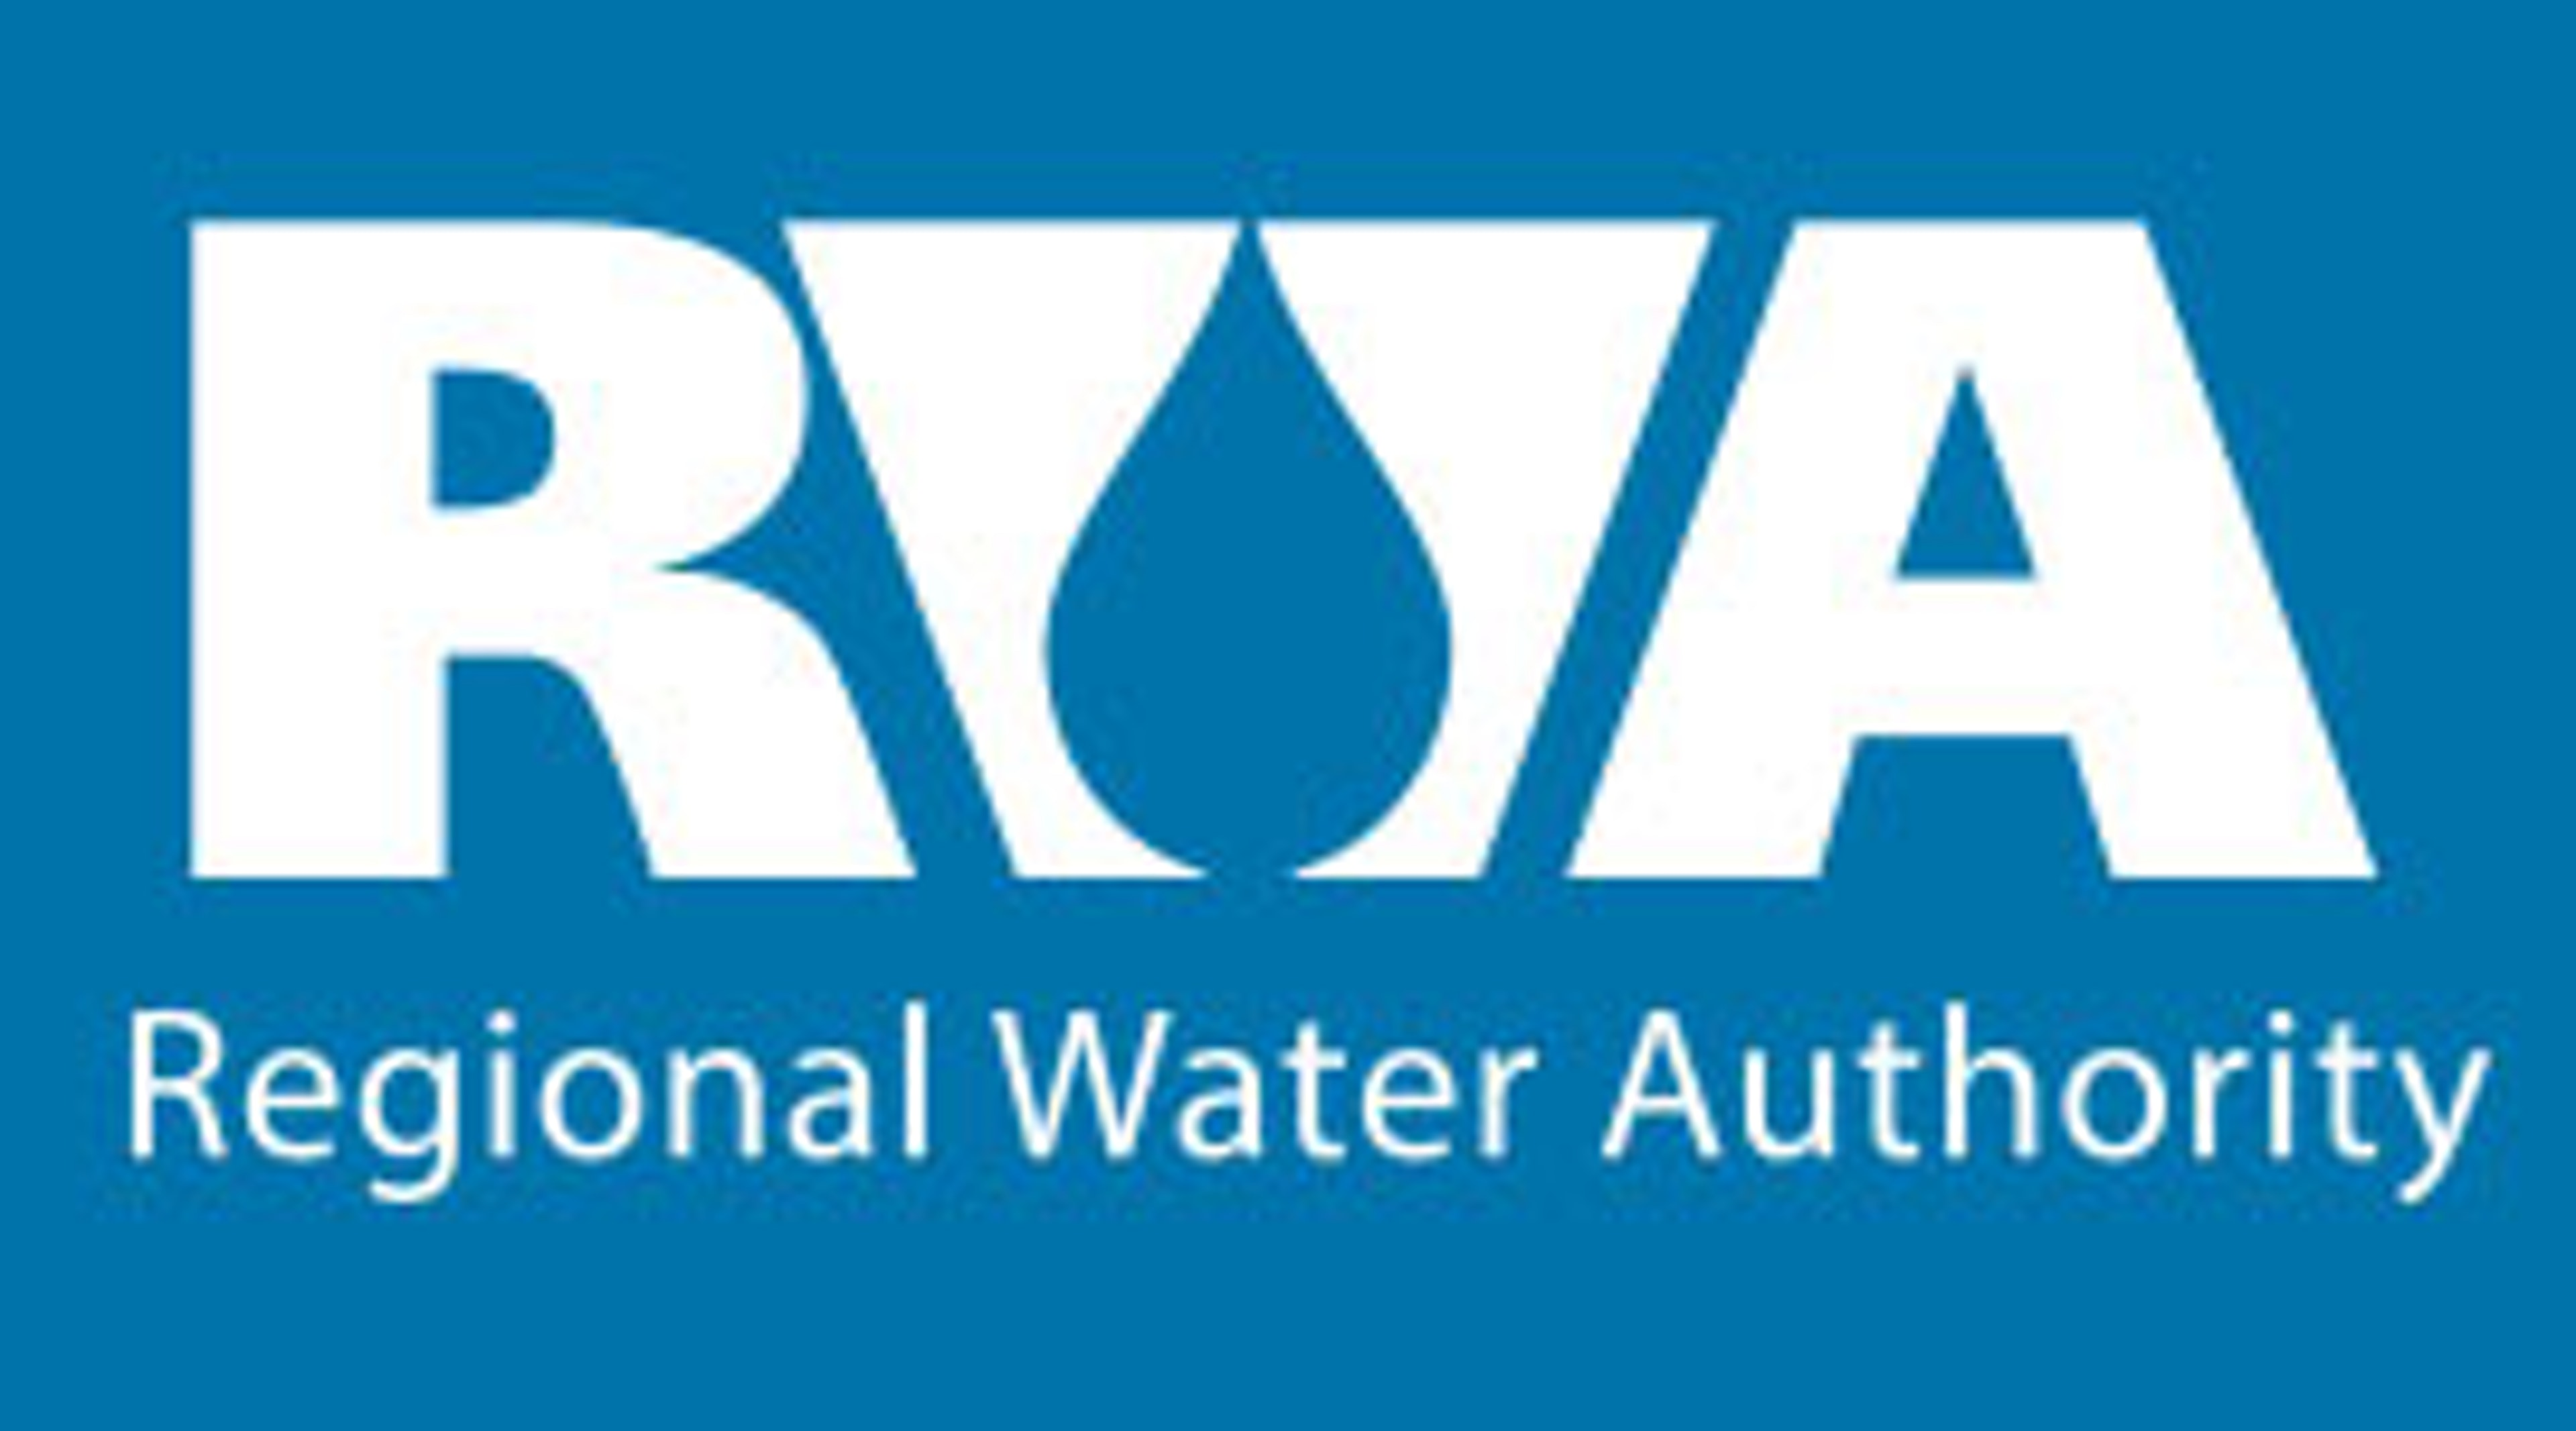 Regional Water Authority logo